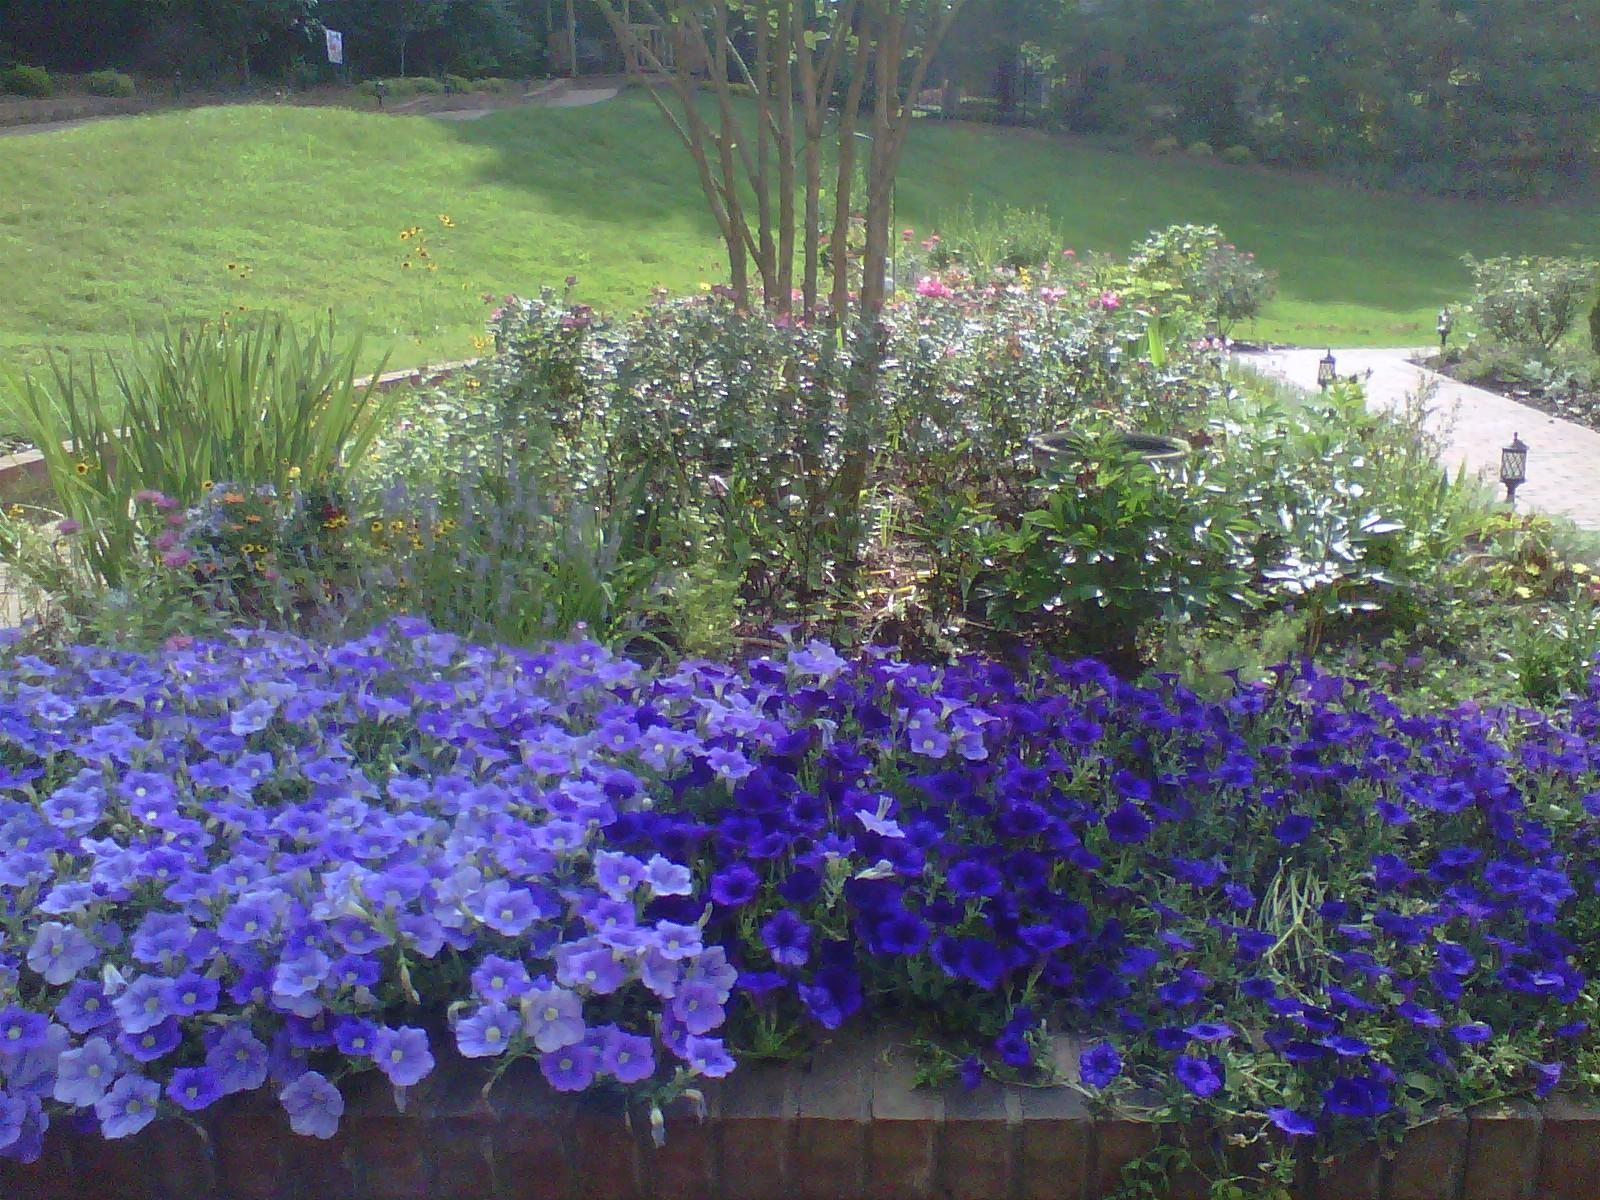 Beautiful purple wave petunias